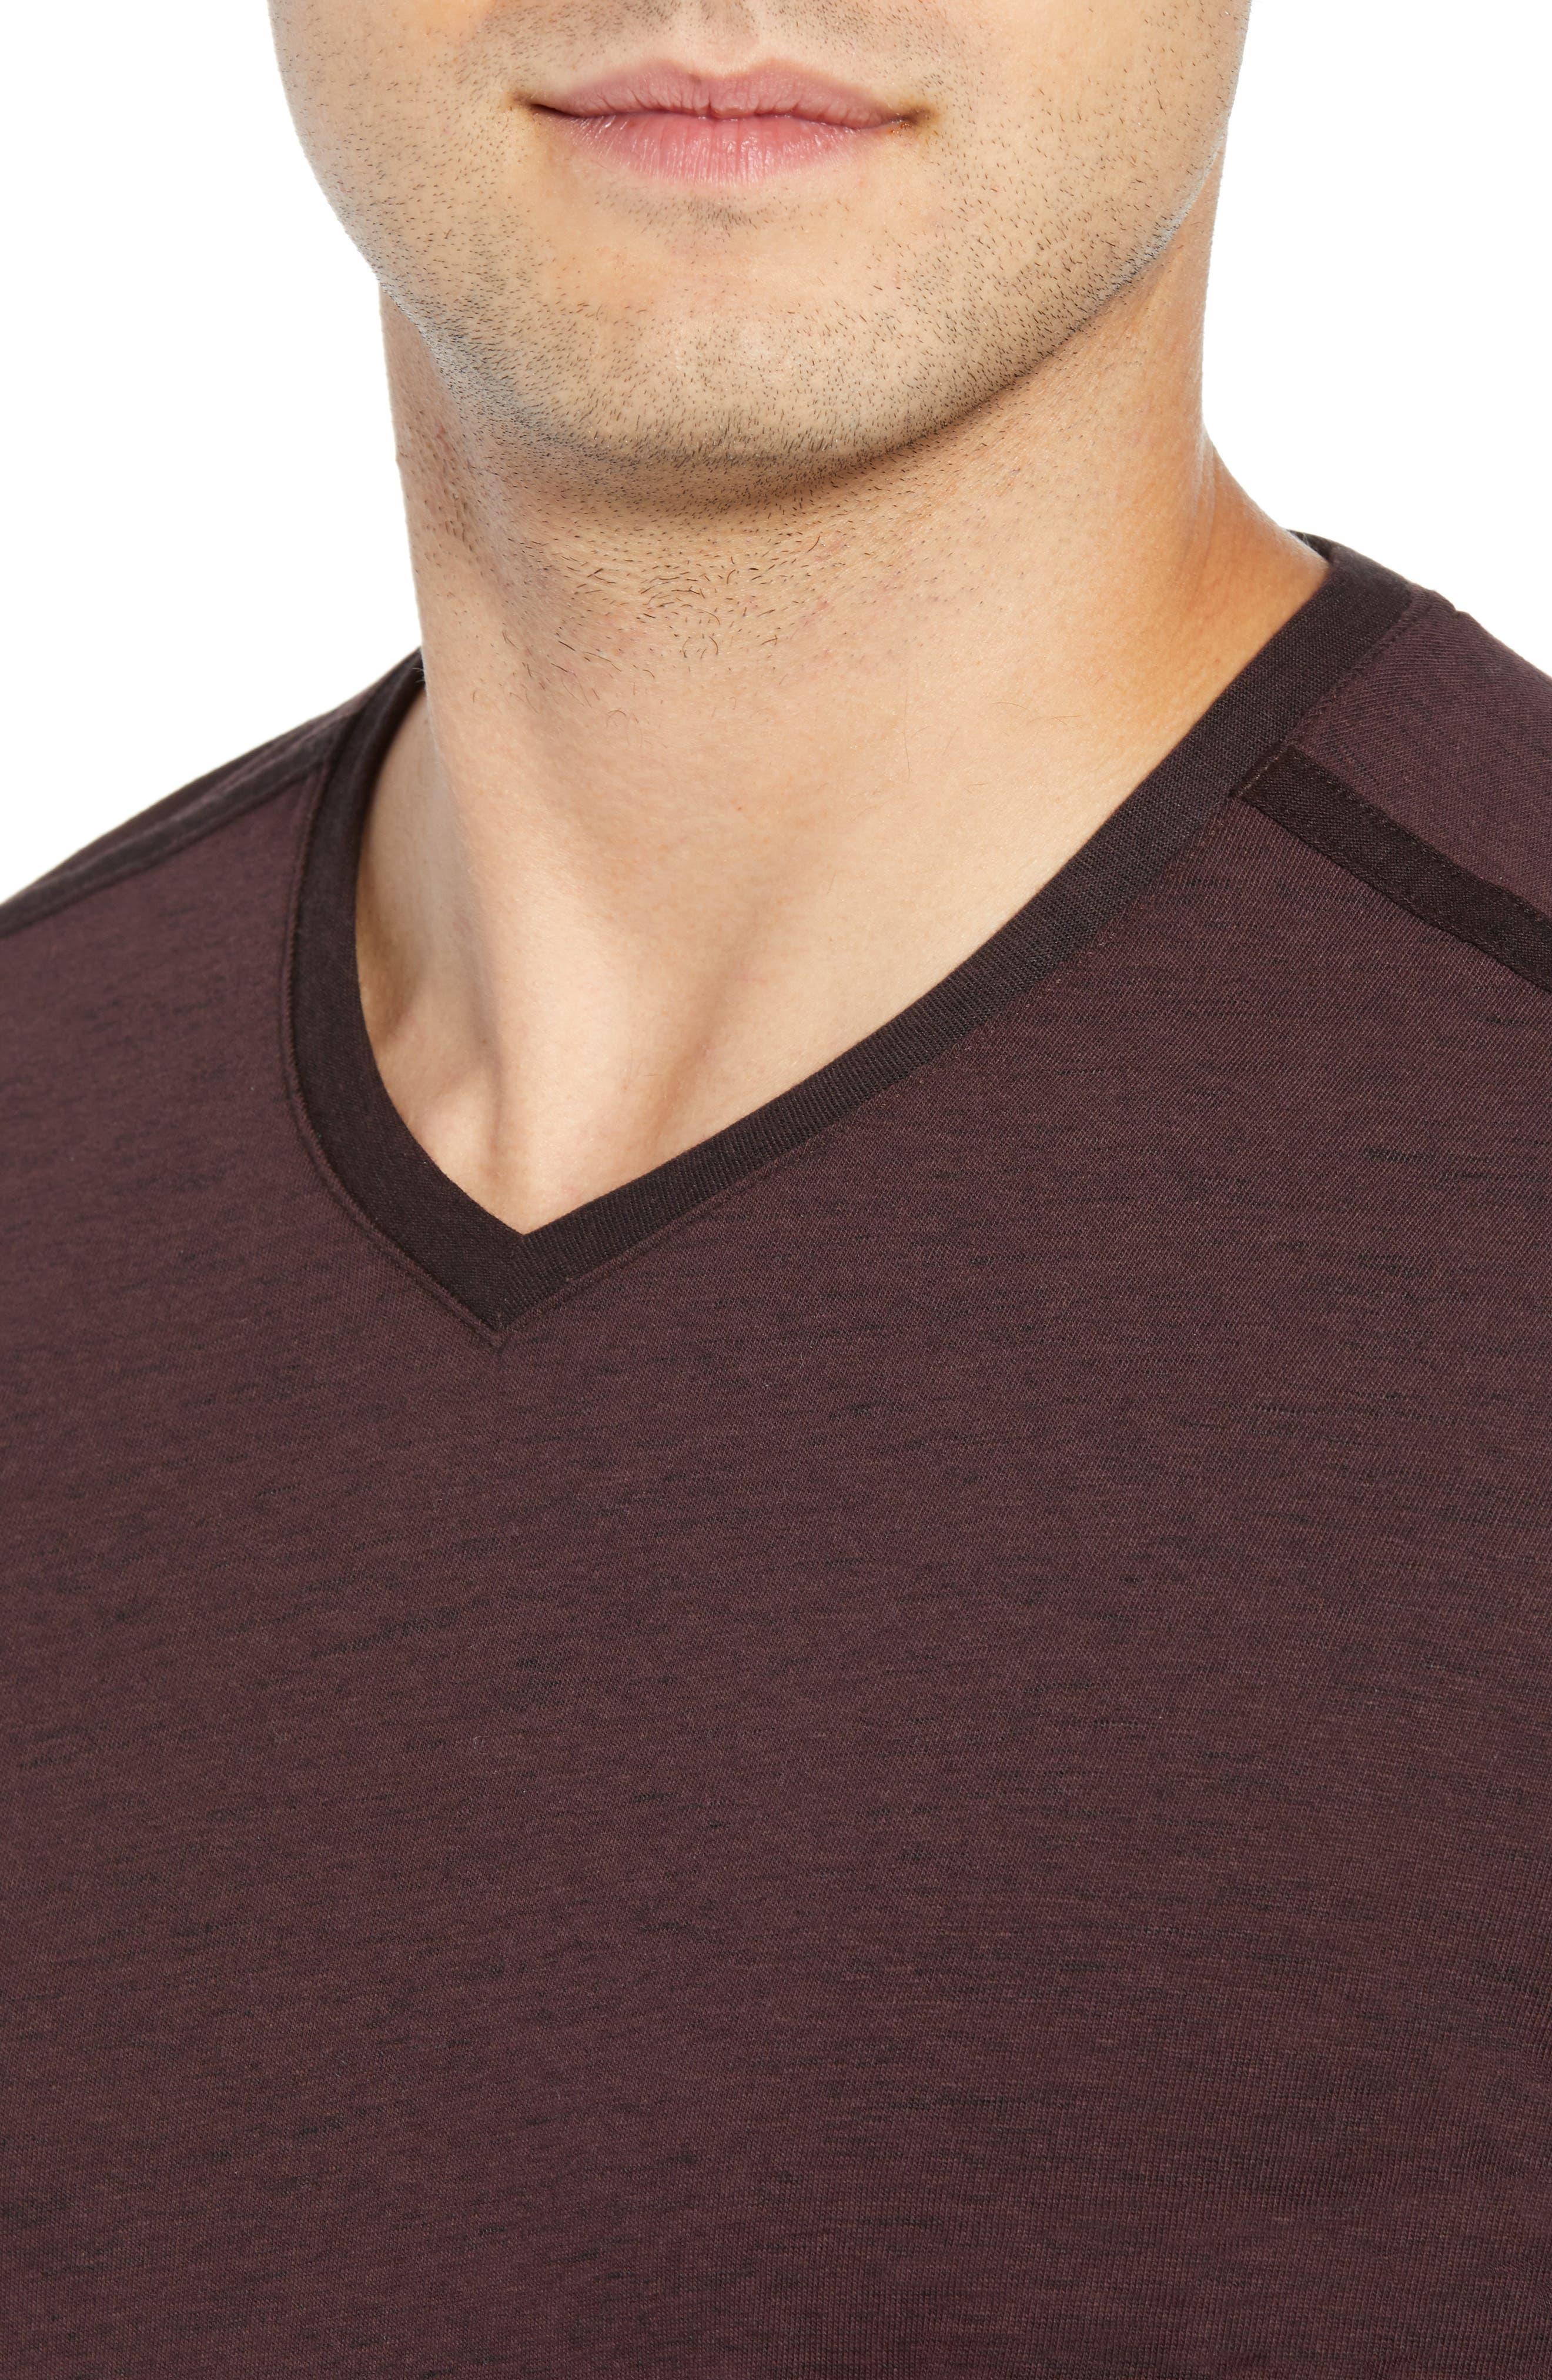 Flatrock Regular Fit V-Neck T-Shirt,                             Alternate thumbnail 4, color,                             PORT